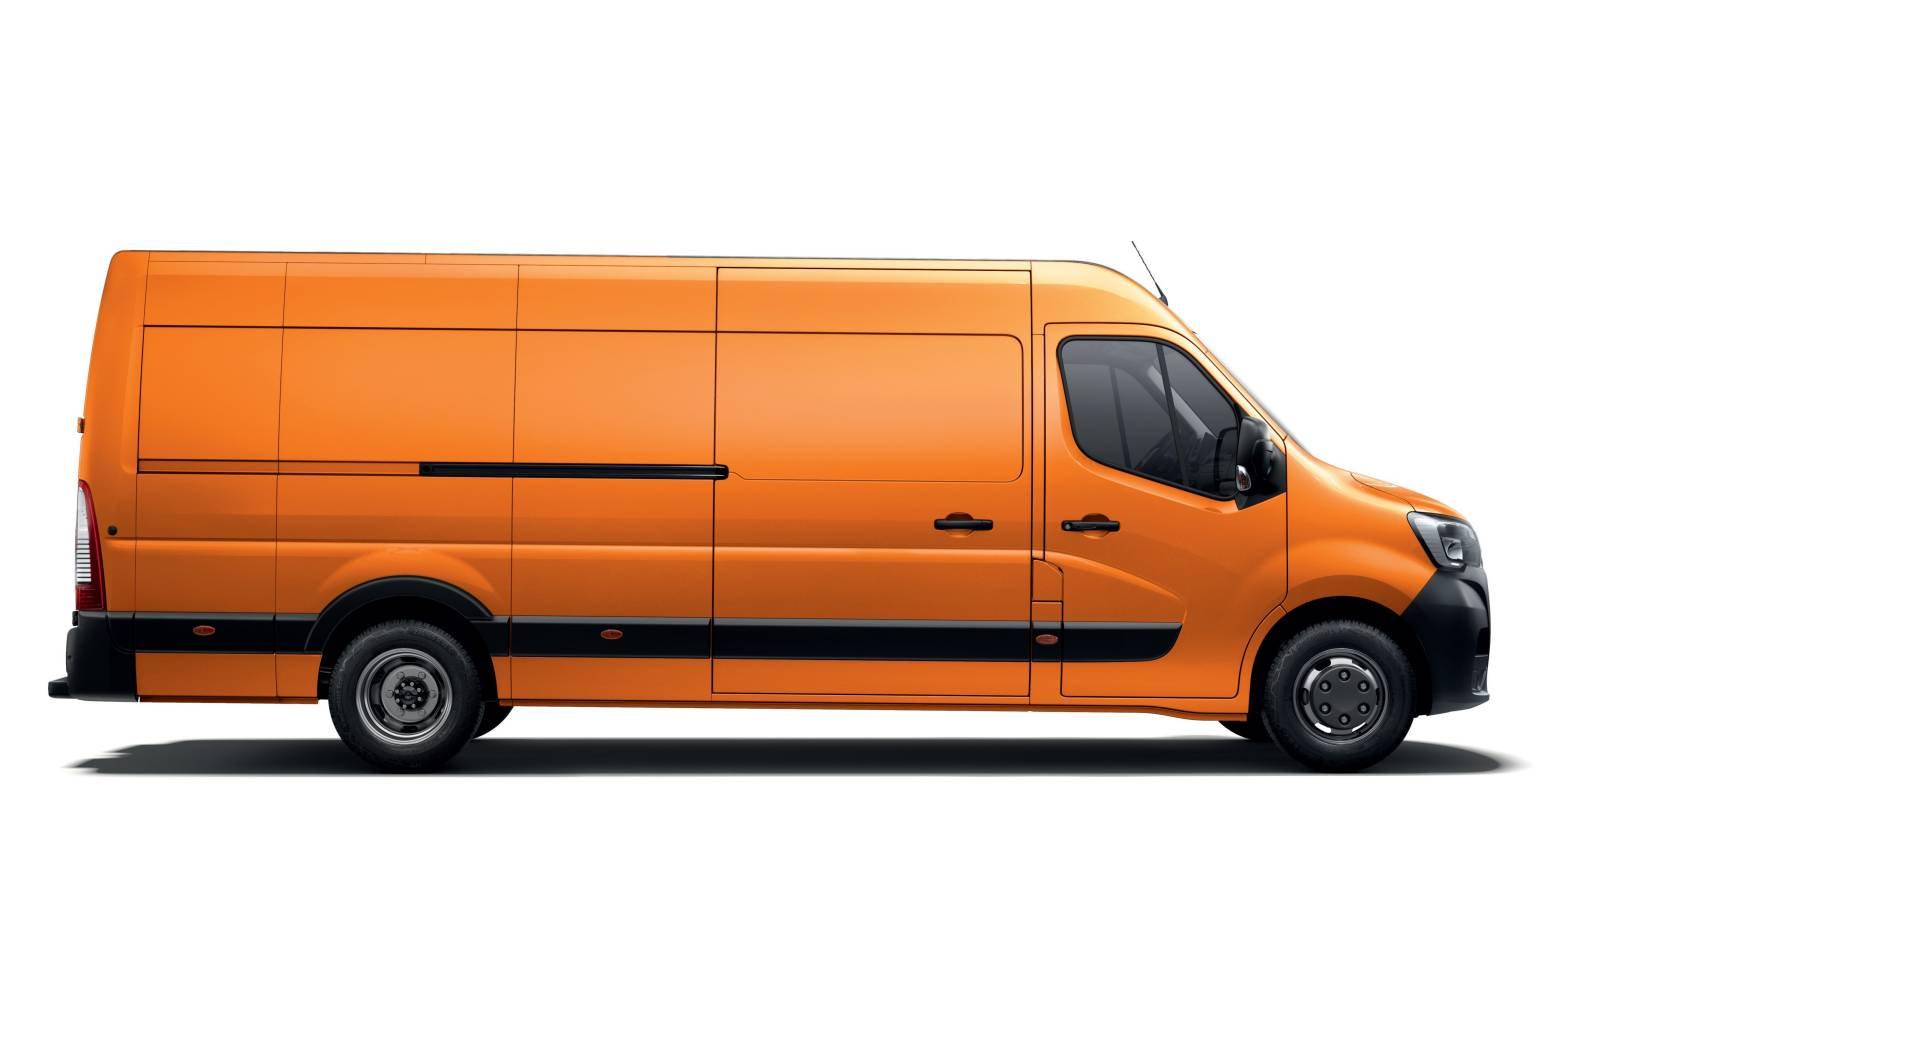 e8a4920e-2019my-renault-master-van-facelift-16